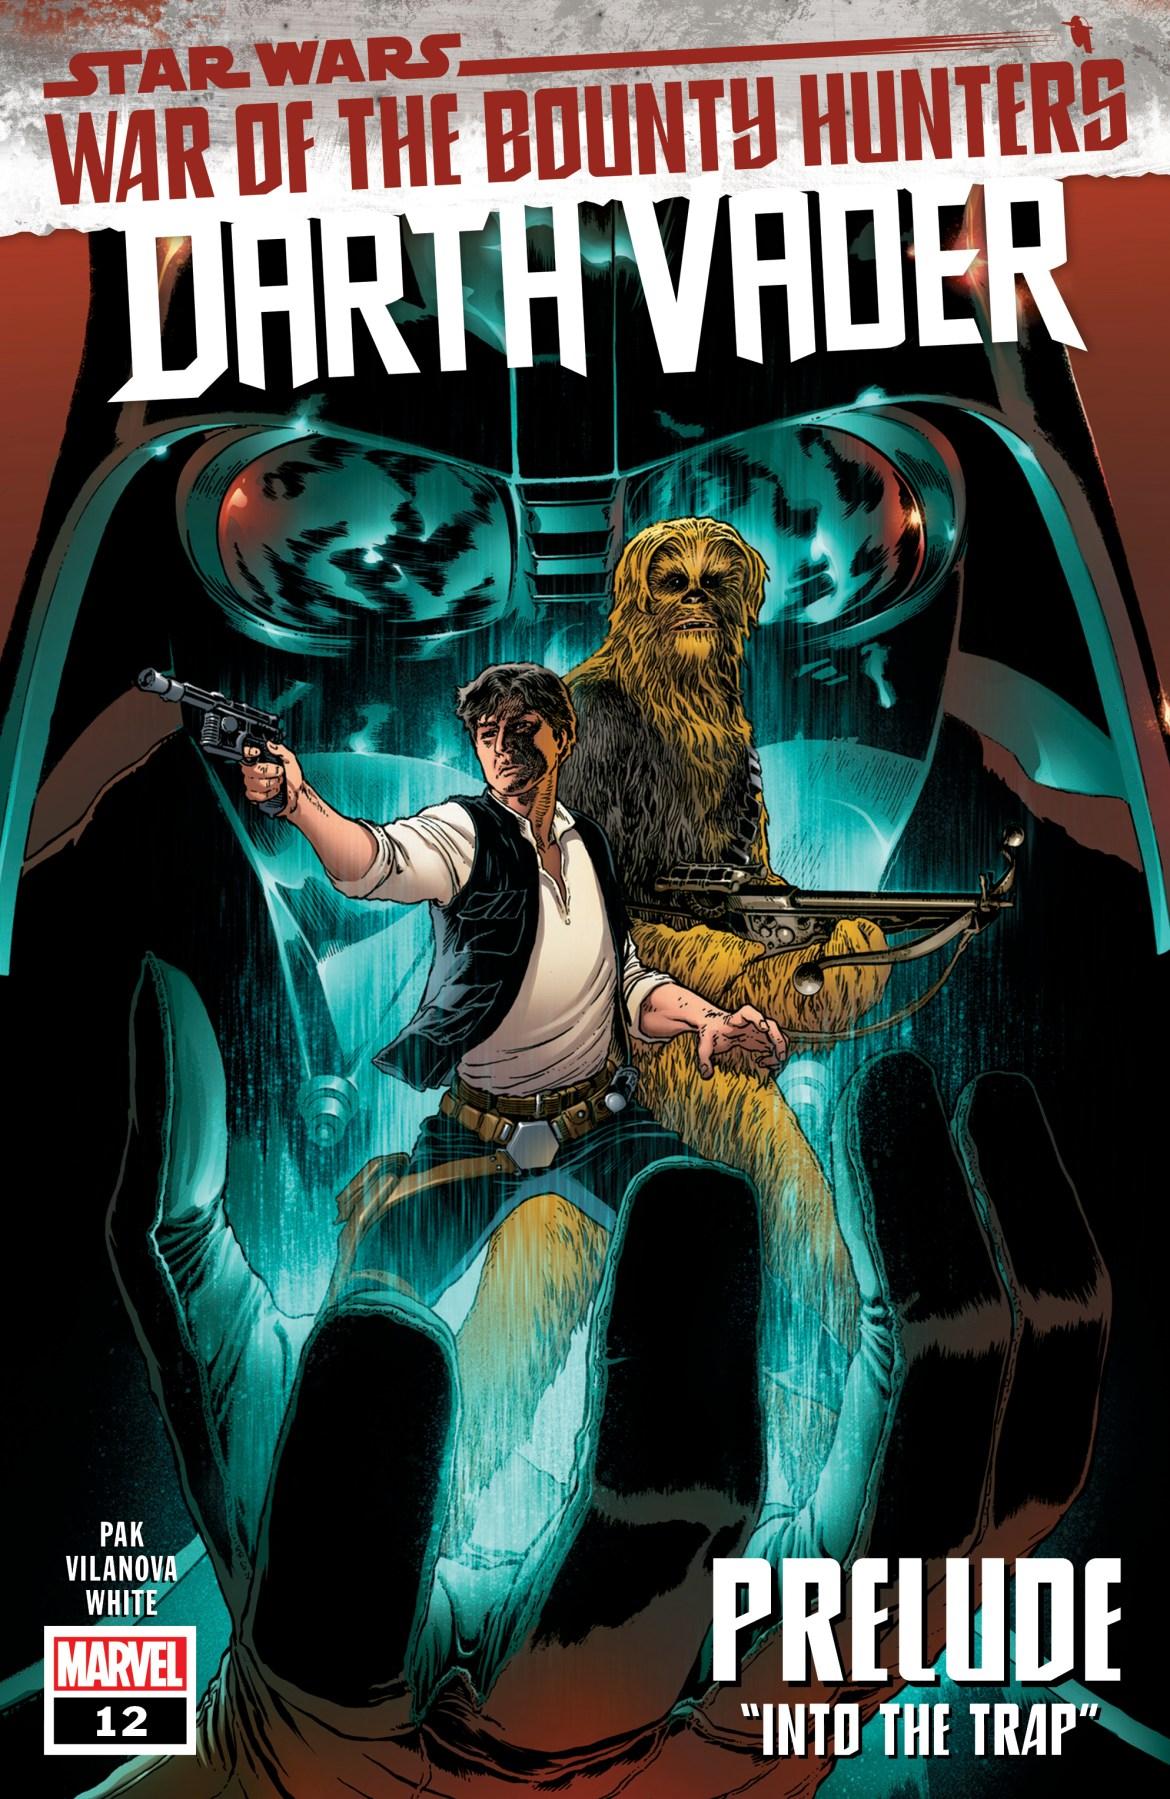 2021_STW-WOTBH_DarthVader_12-1 Marvel Comics May 2021 Solicitations